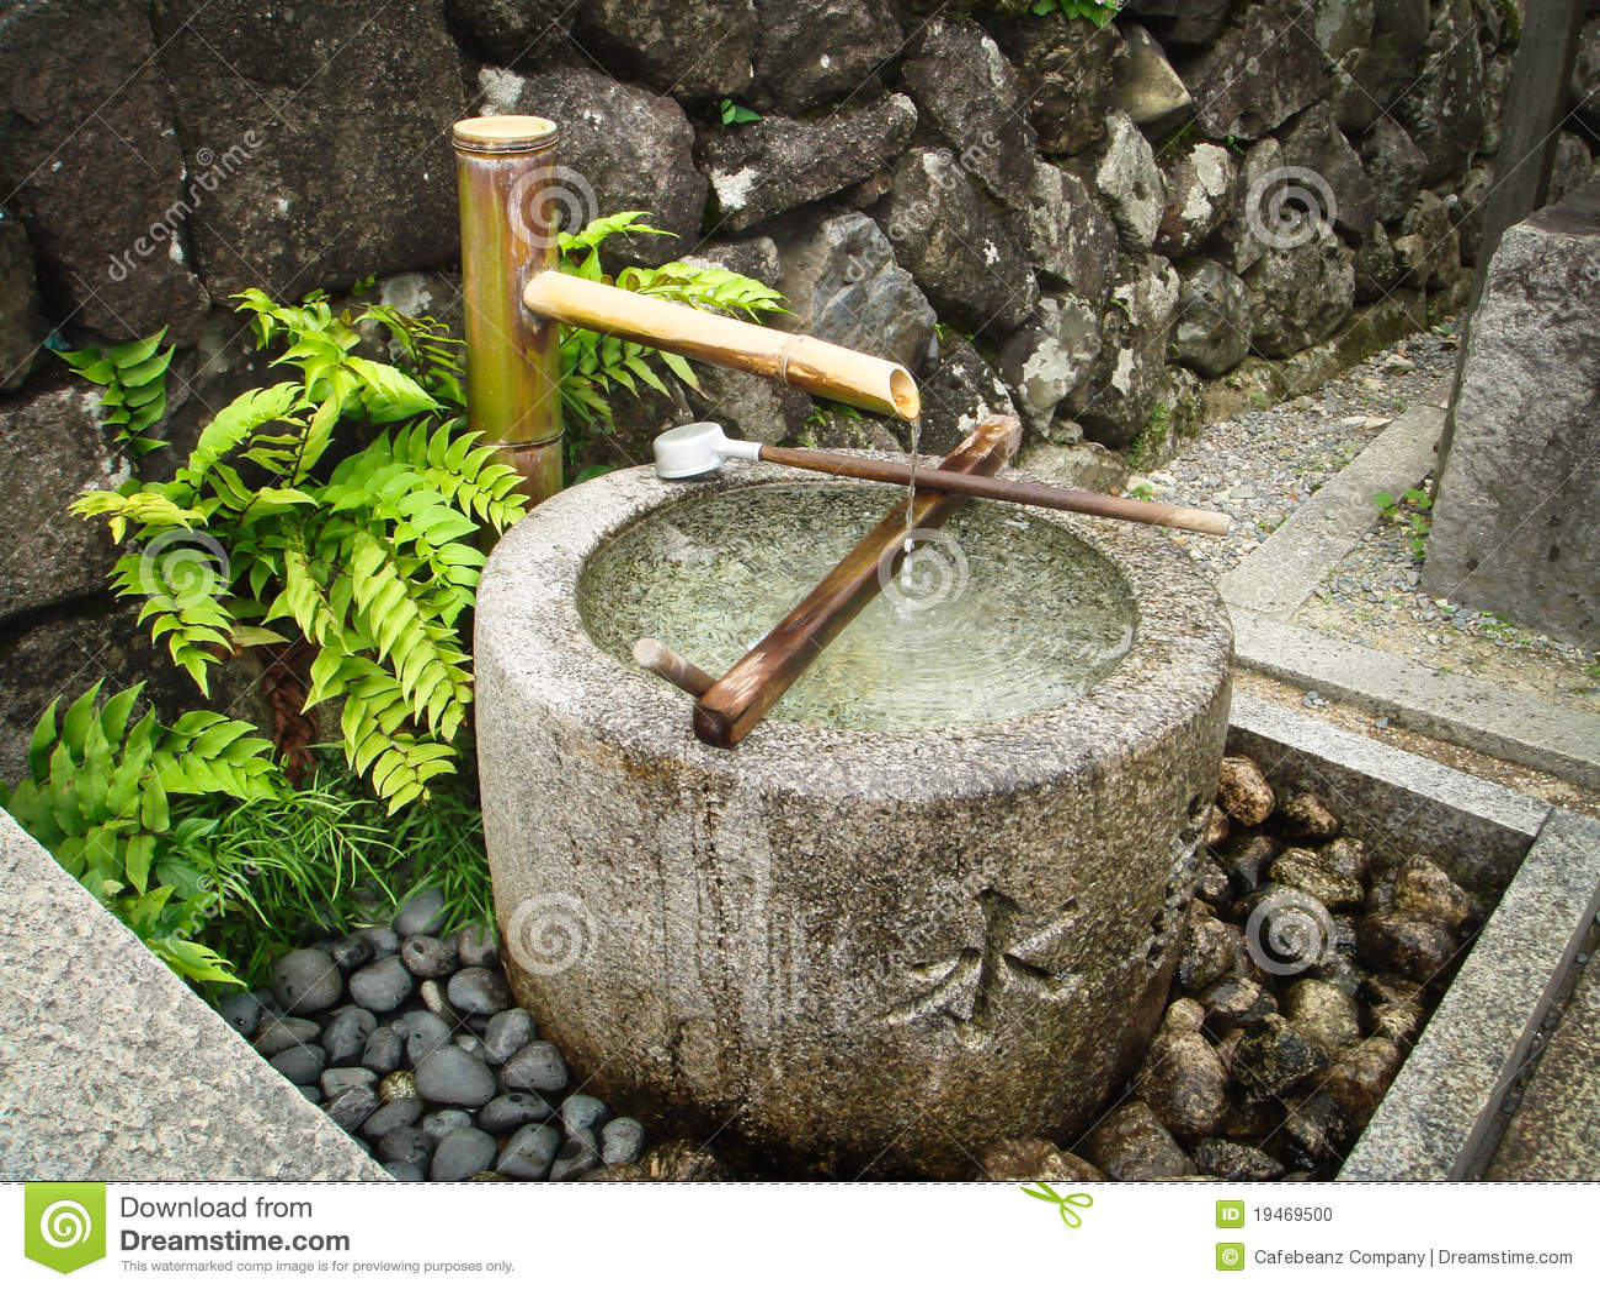 Japan Fountain At Shrine Stock Photo Image Of Drinking